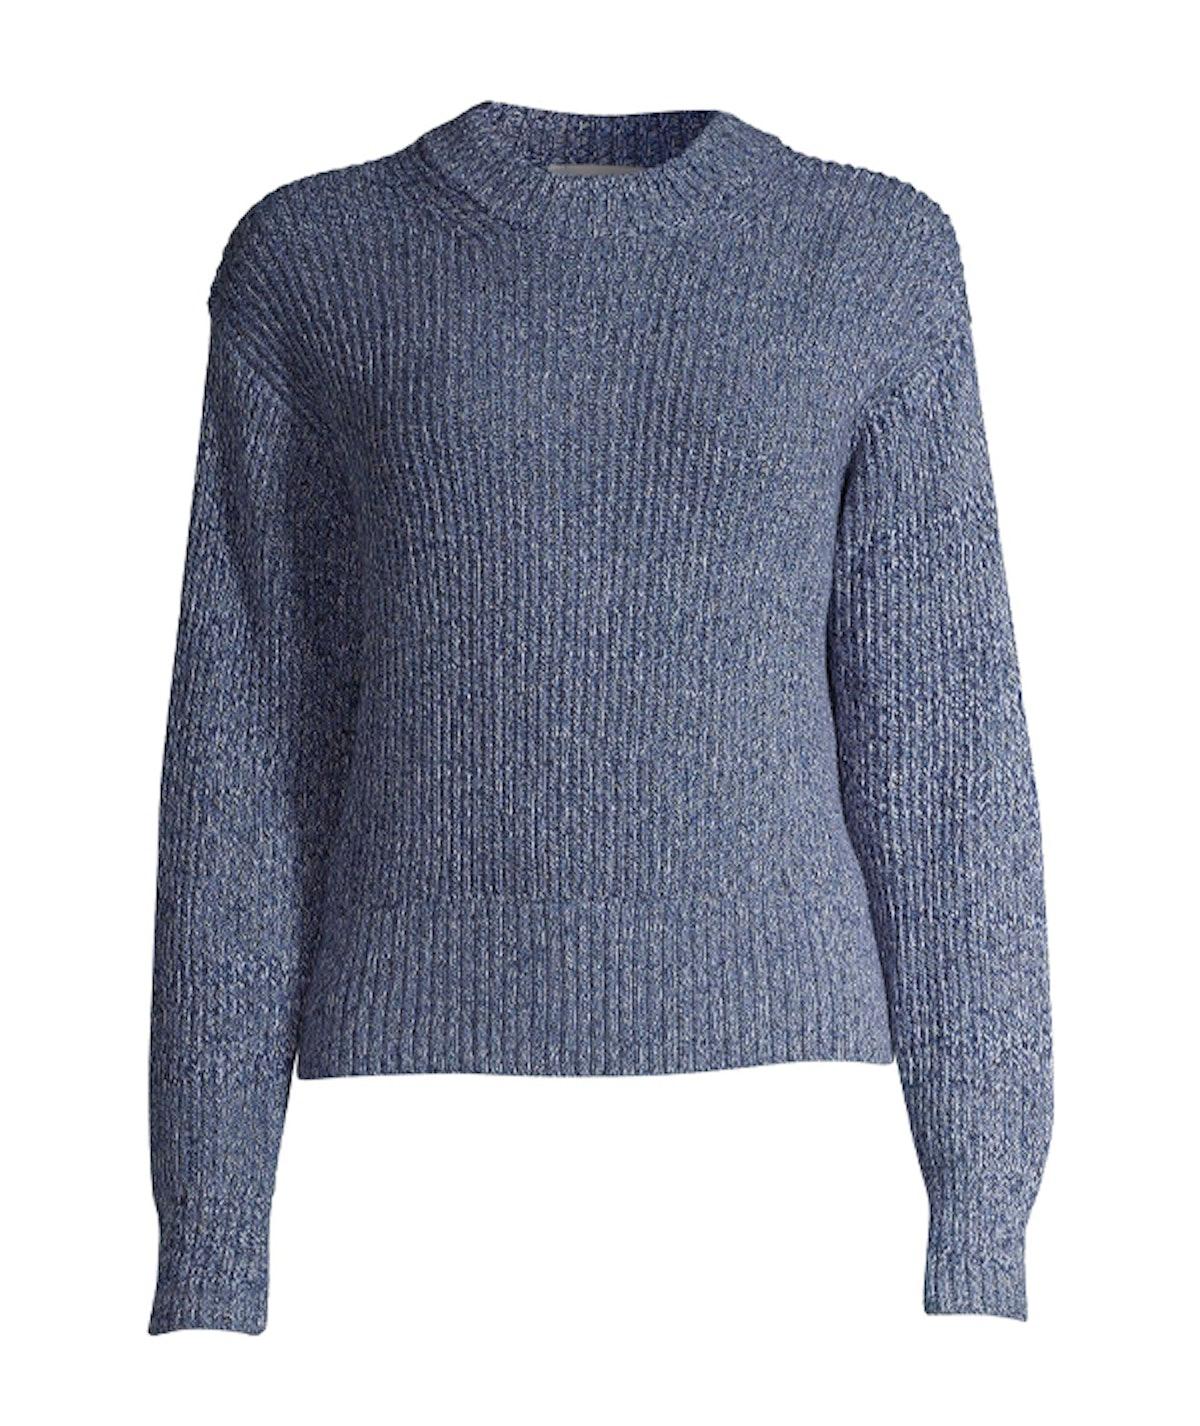 Marled Chunky Crewneck Sweater